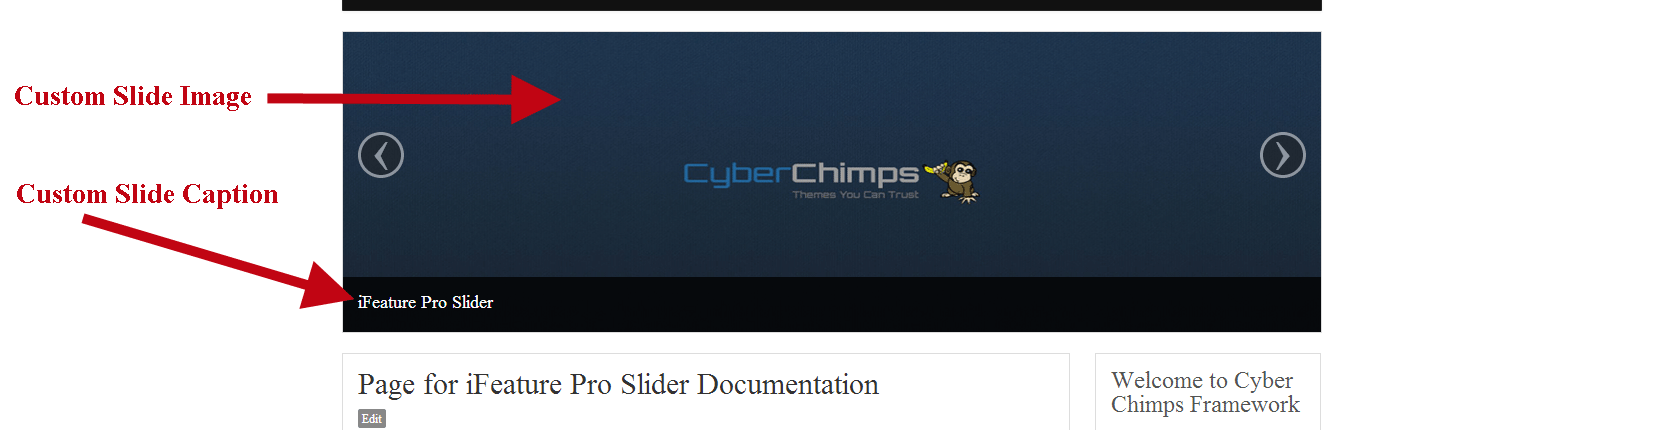 Custom Slide Image and caption